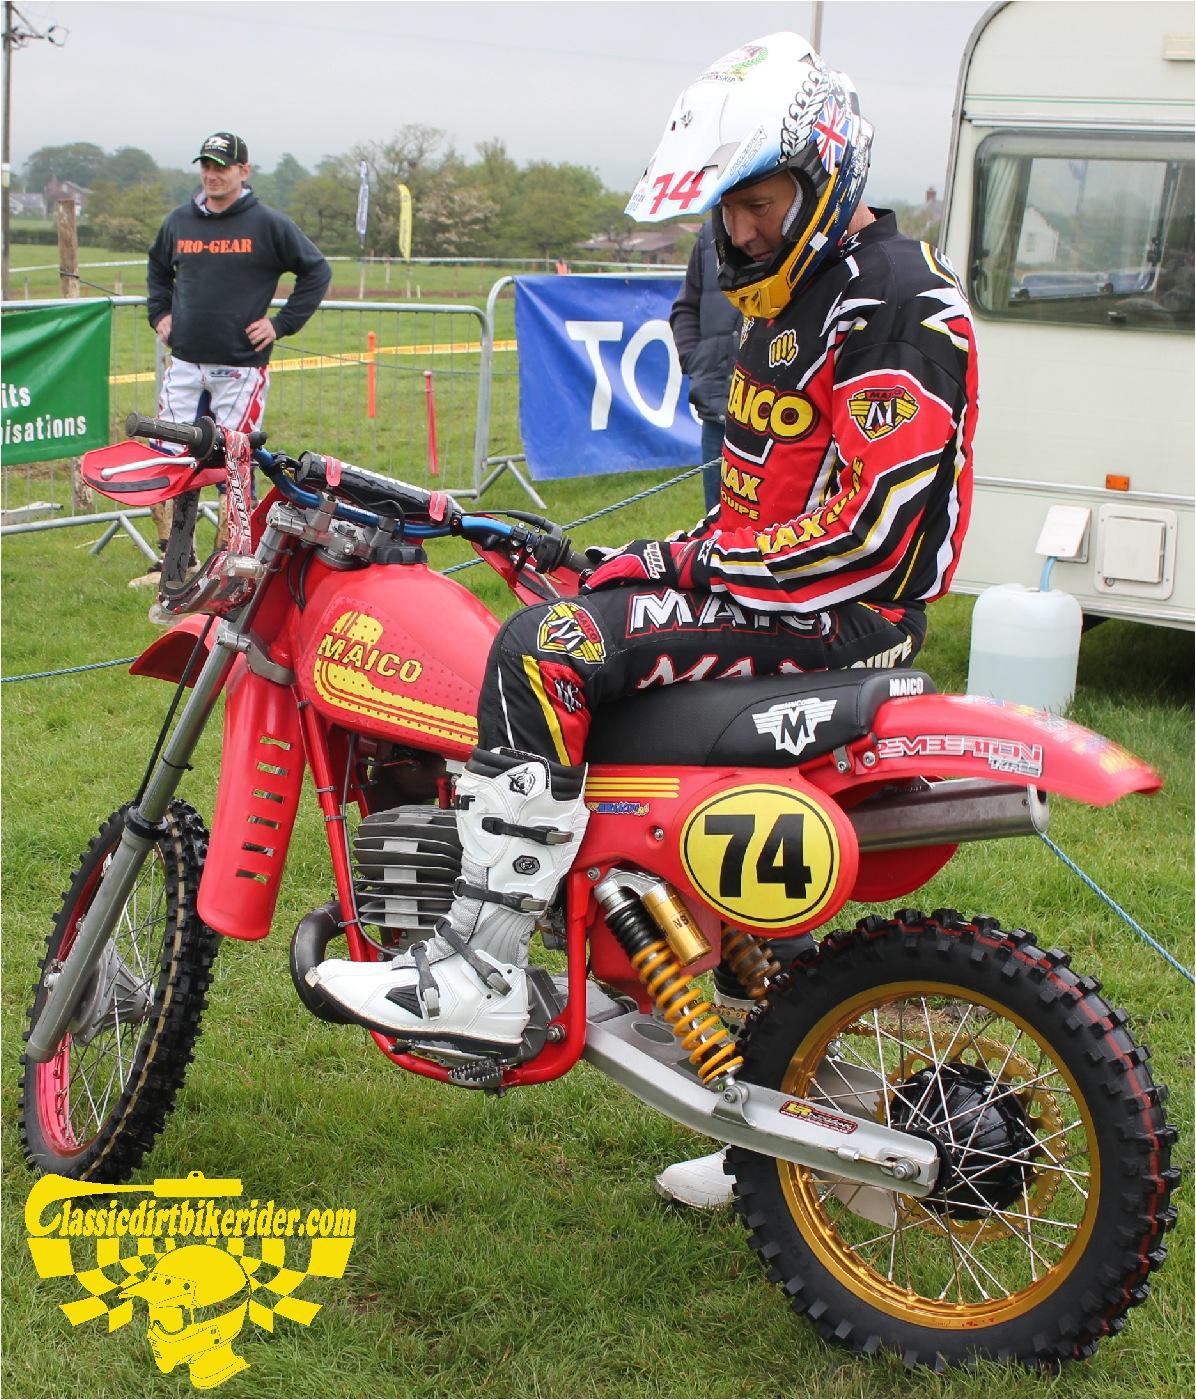 classicdirtbikerider.com-national-twinshock-championship-2015-Garstang-MAICO 490...